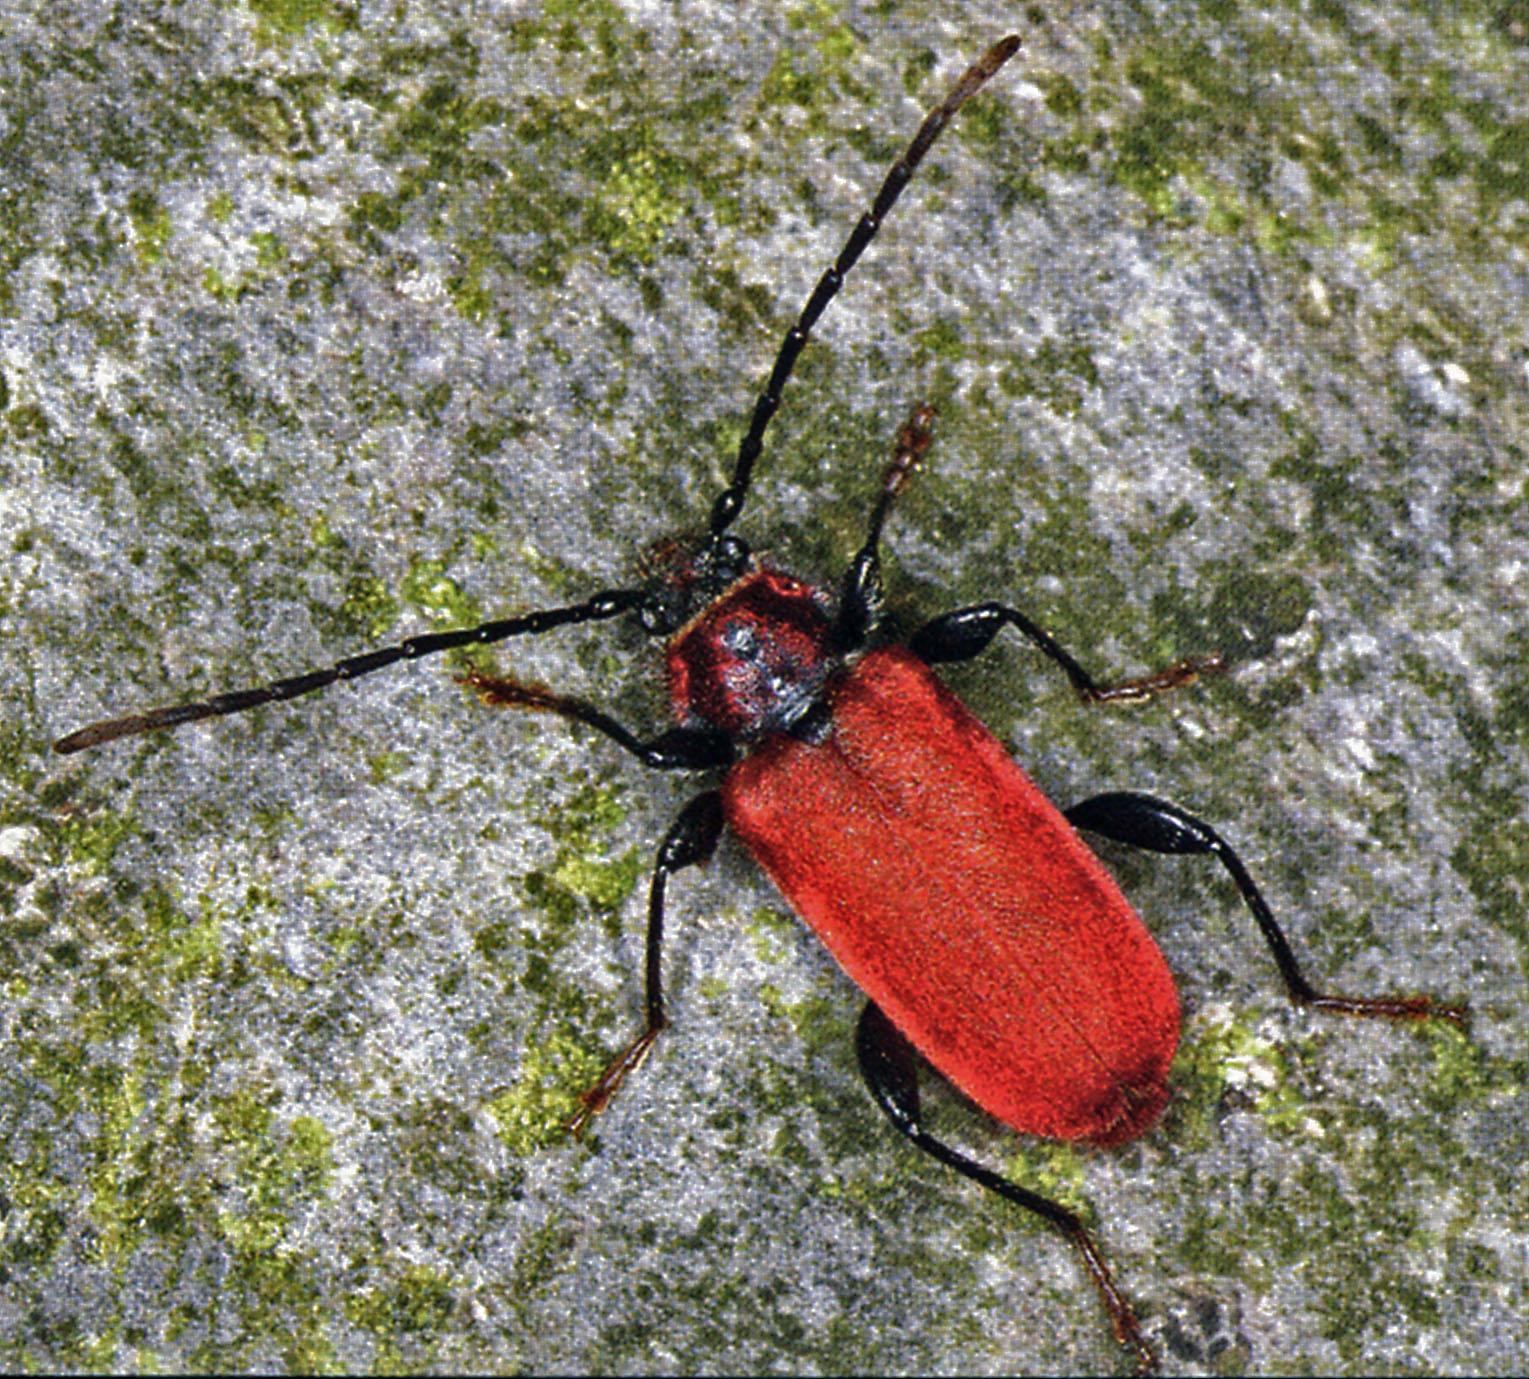 Roter Scheibenbock (Pyrrhidium sanguineum). © E. Wachmann